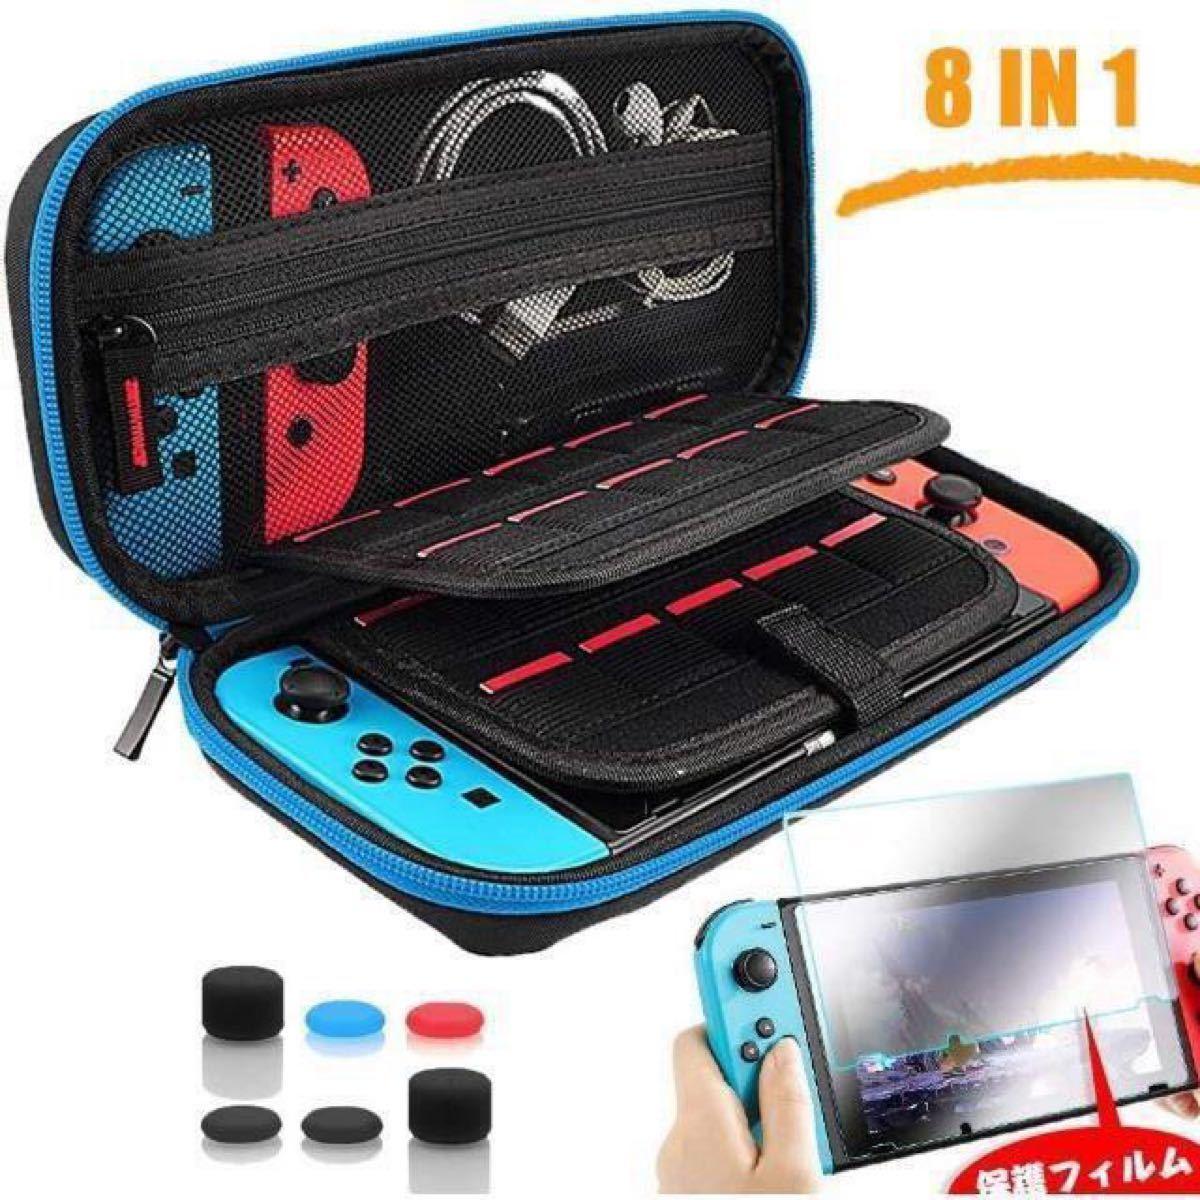 Nintendo Switch 任天堂スイッチケース 収納バッグ